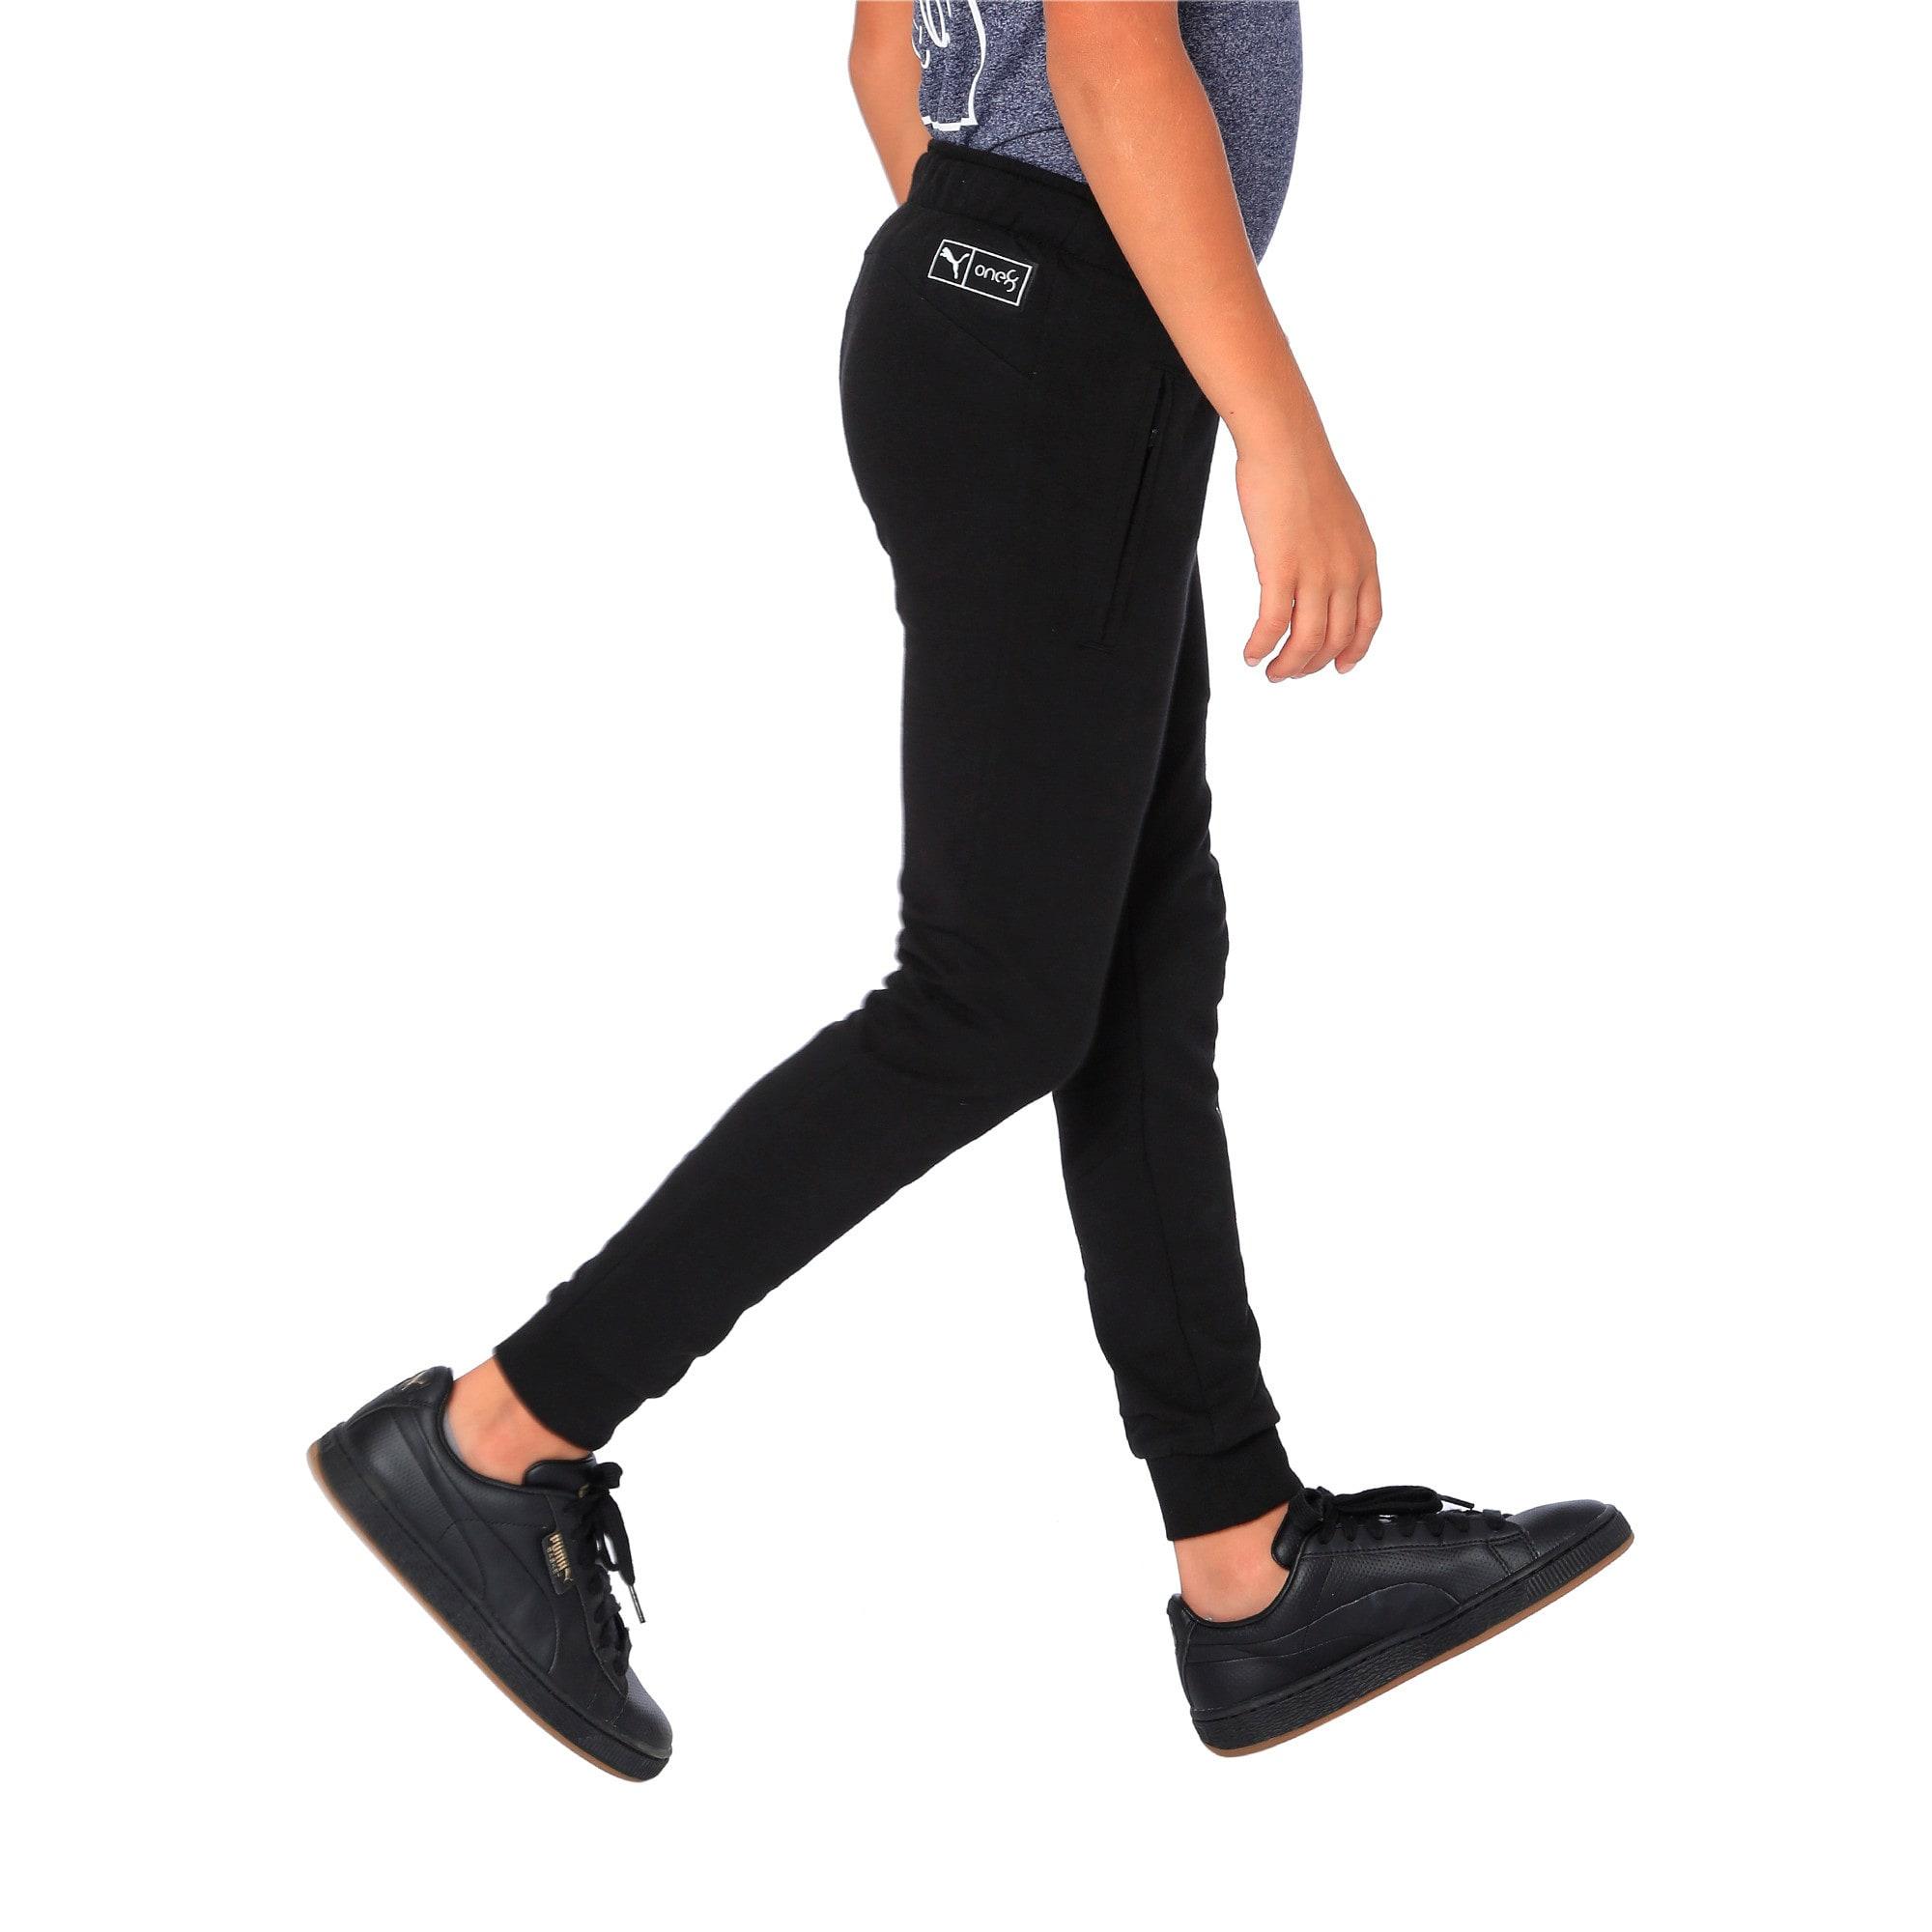 Thumbnail 2 of one8 VK Kids' Sweat Pants, Puma Black, medium-IND